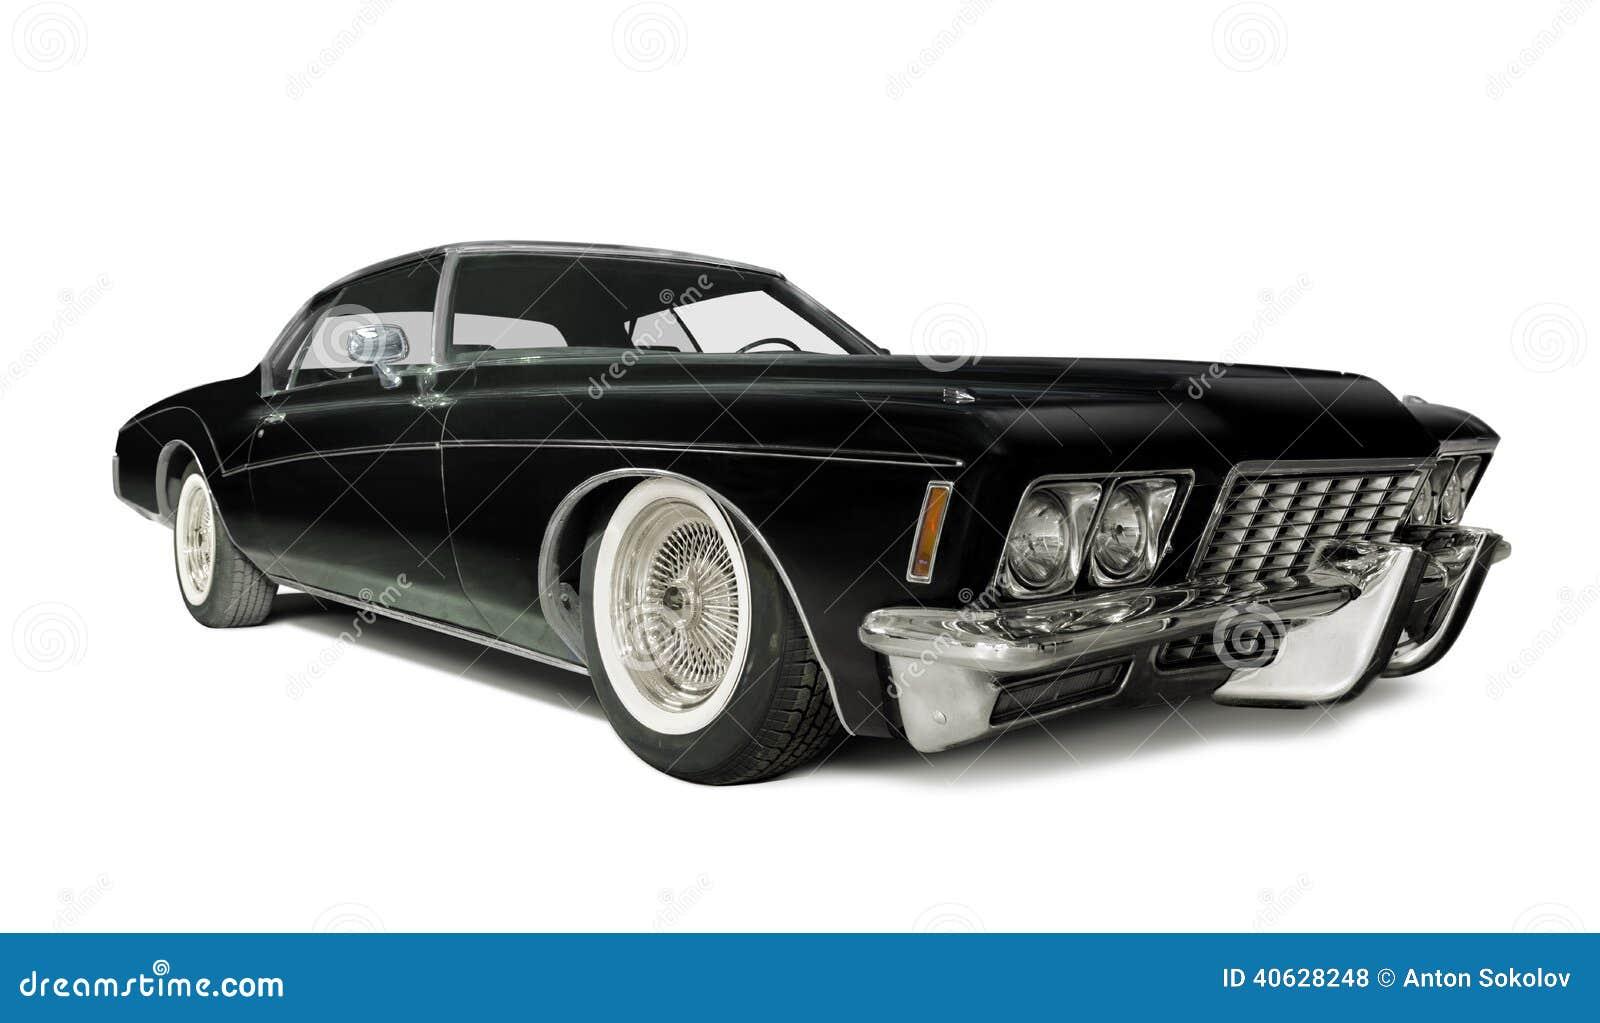 Buick Riviera 1972